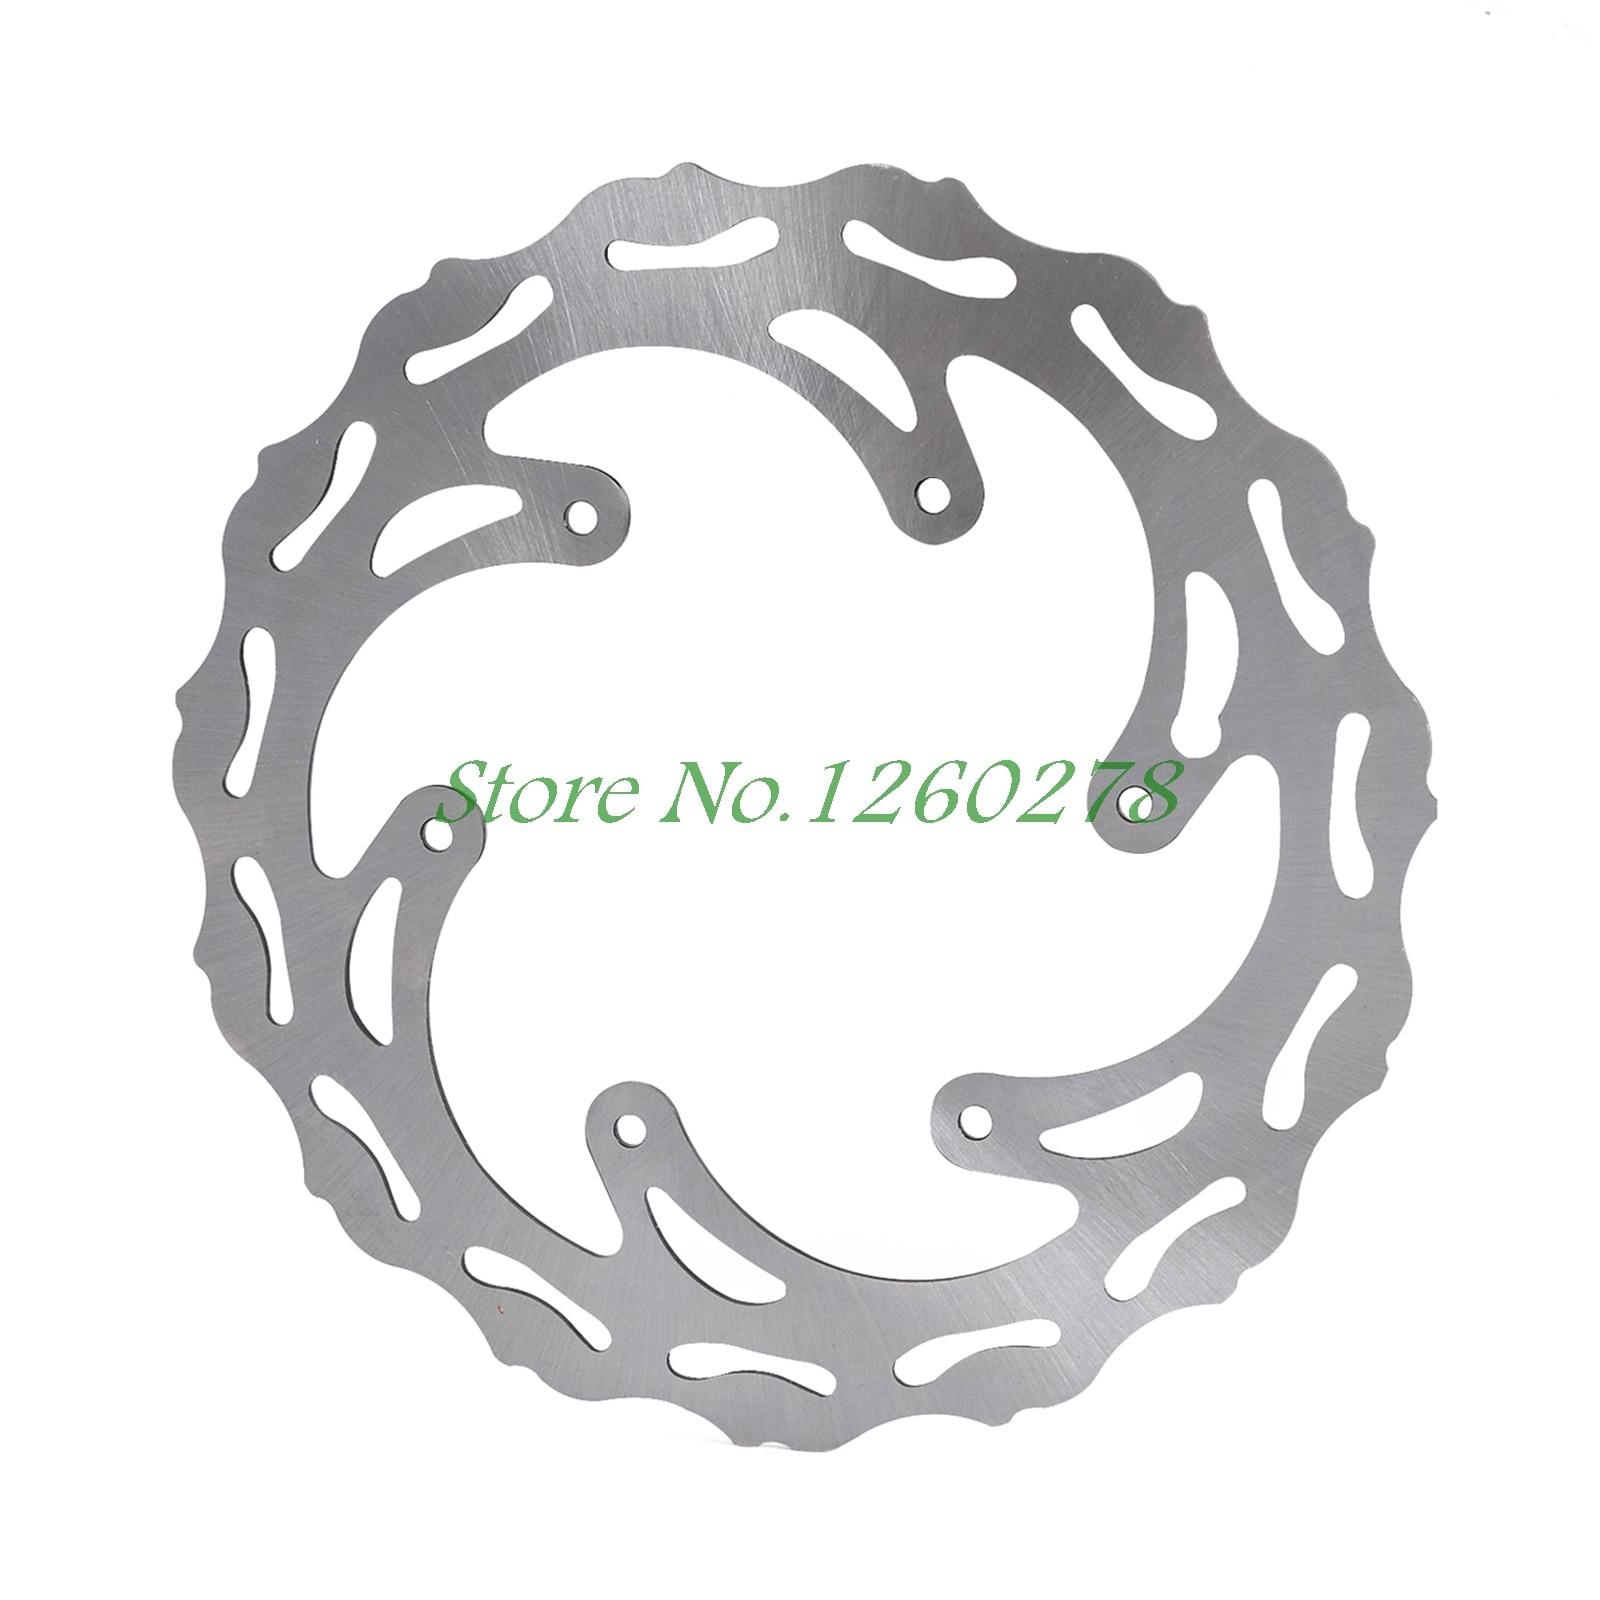 Front Wavy Brake Disc Rotor For Husaberg FE TE FX 250 300 350 450 501 Husqvarna FC TC FE TE 125 250 300 350 501 2014 2015